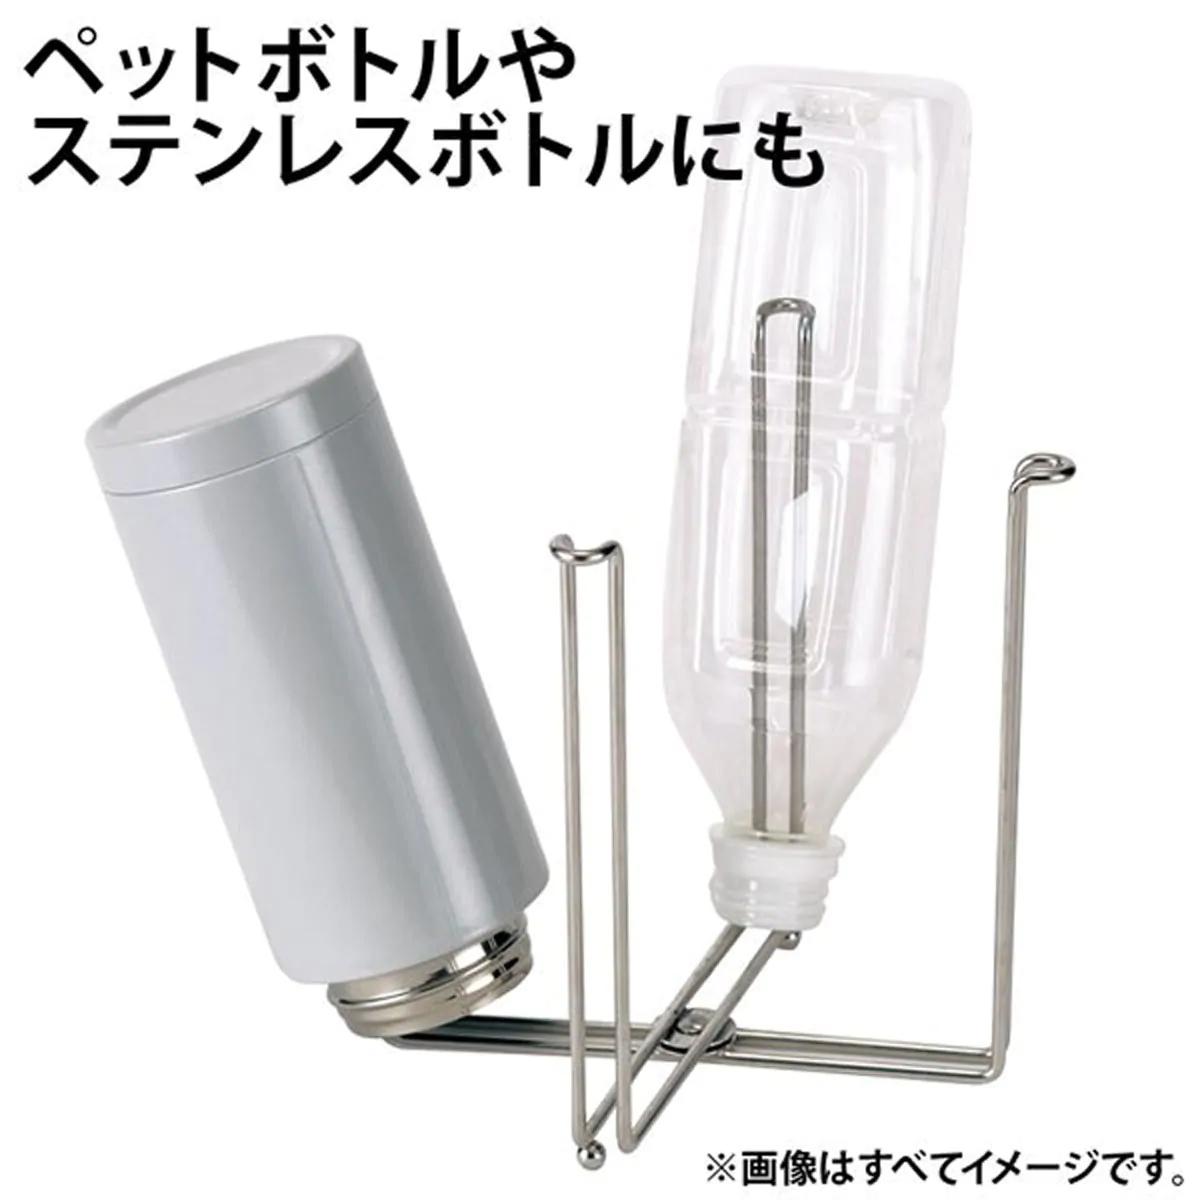 NITORI(ニトリ) ポリ袋スタンドの商品画像6